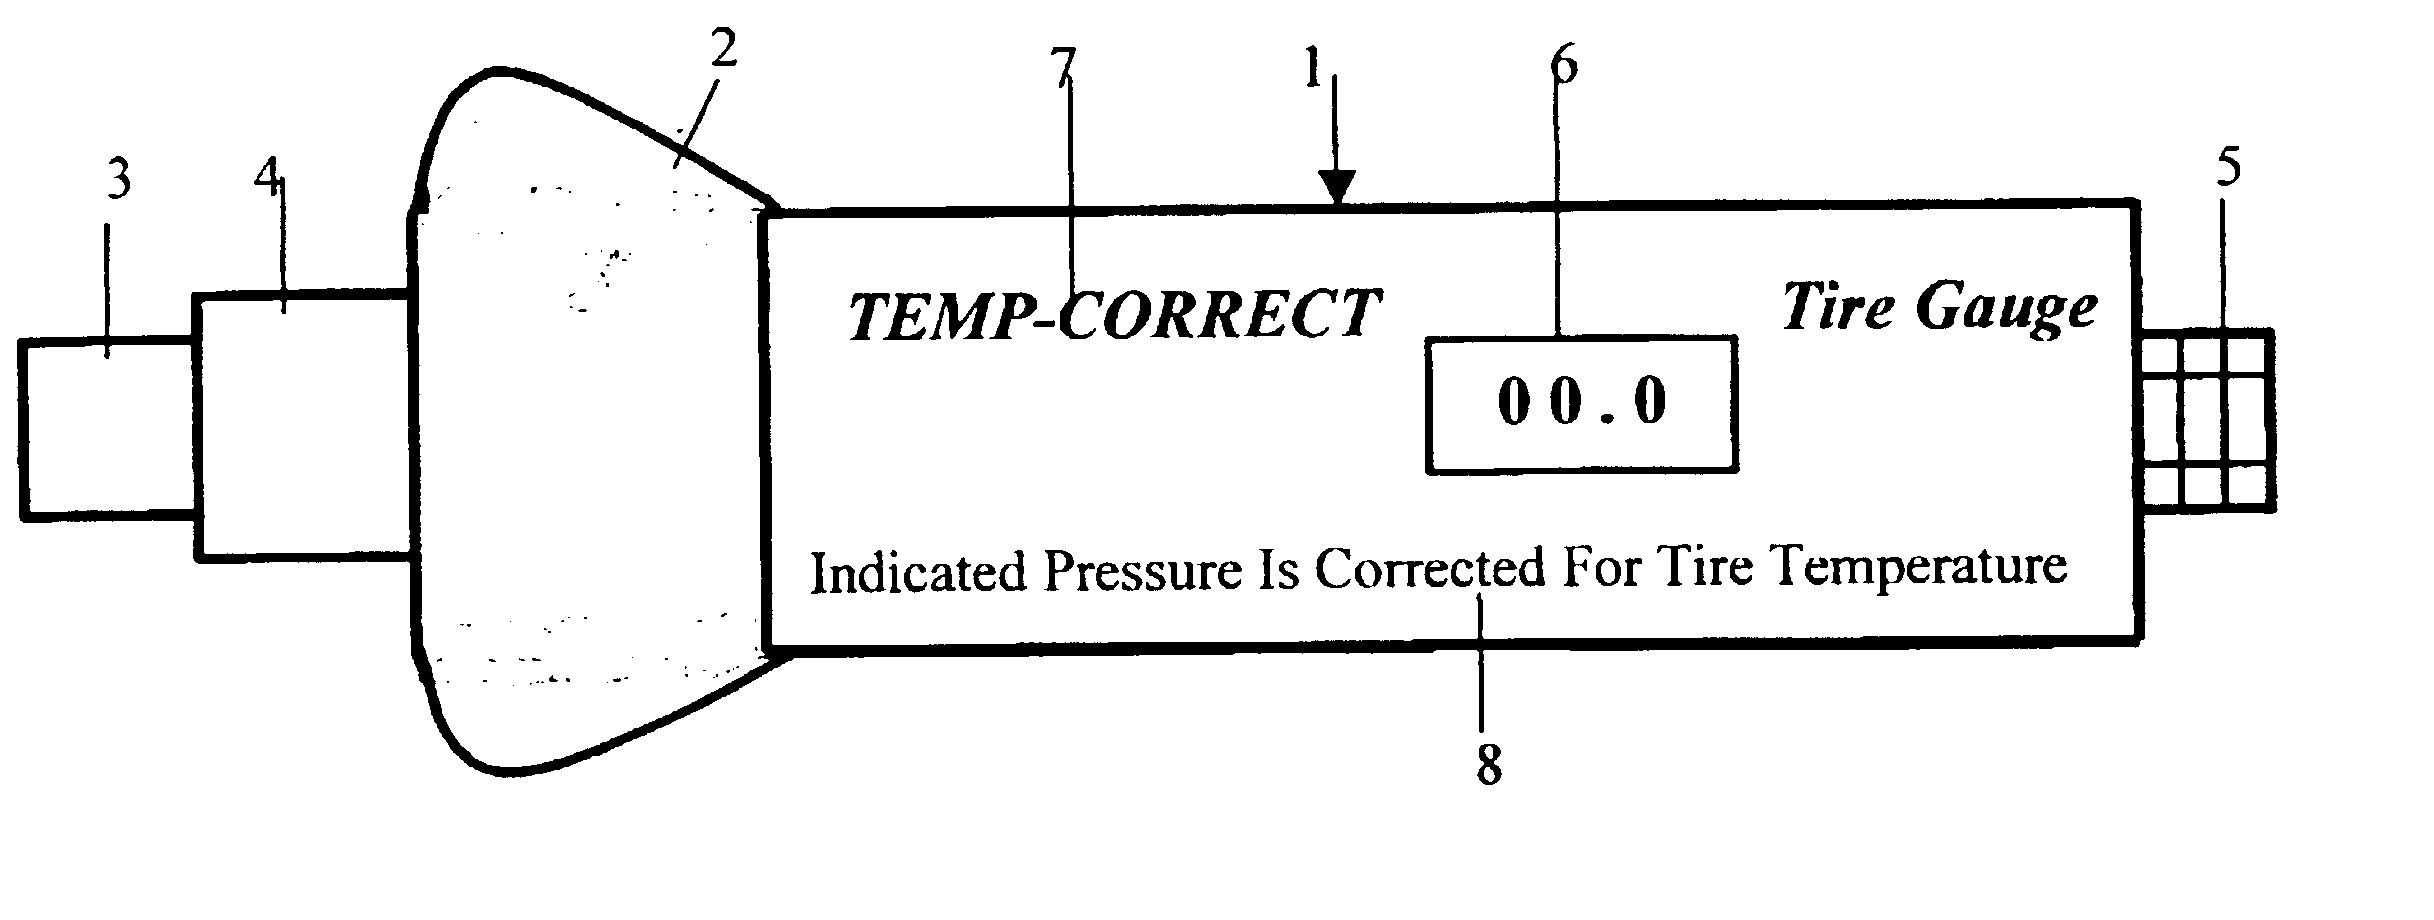 patent us6722193 tire pressure gauge with temperature correction google patents. Black Bedroom Furniture Sets. Home Design Ideas